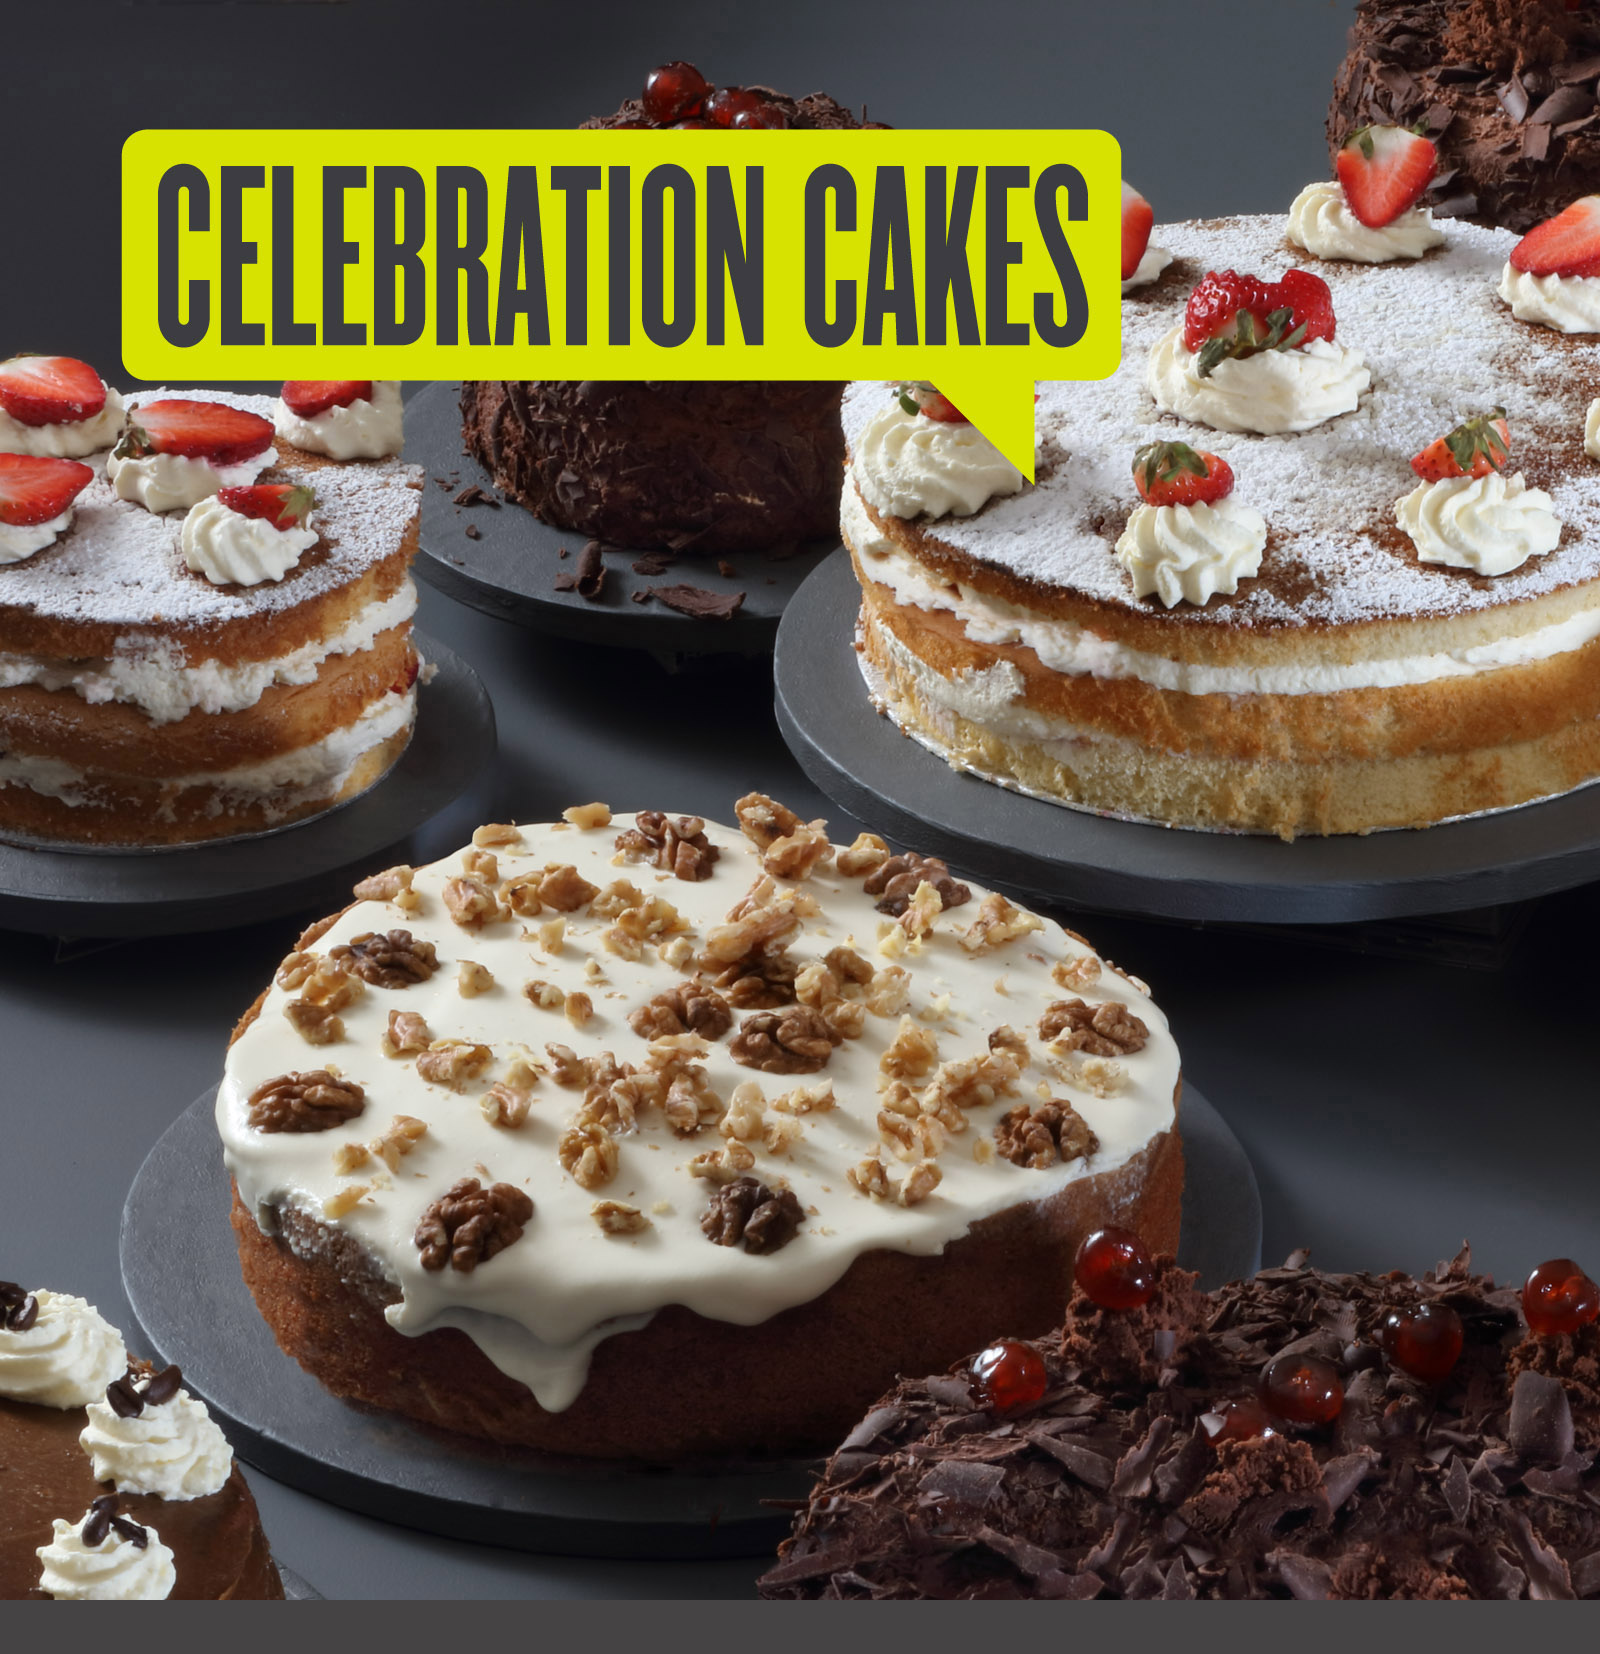 celebration cakes copy.jpg